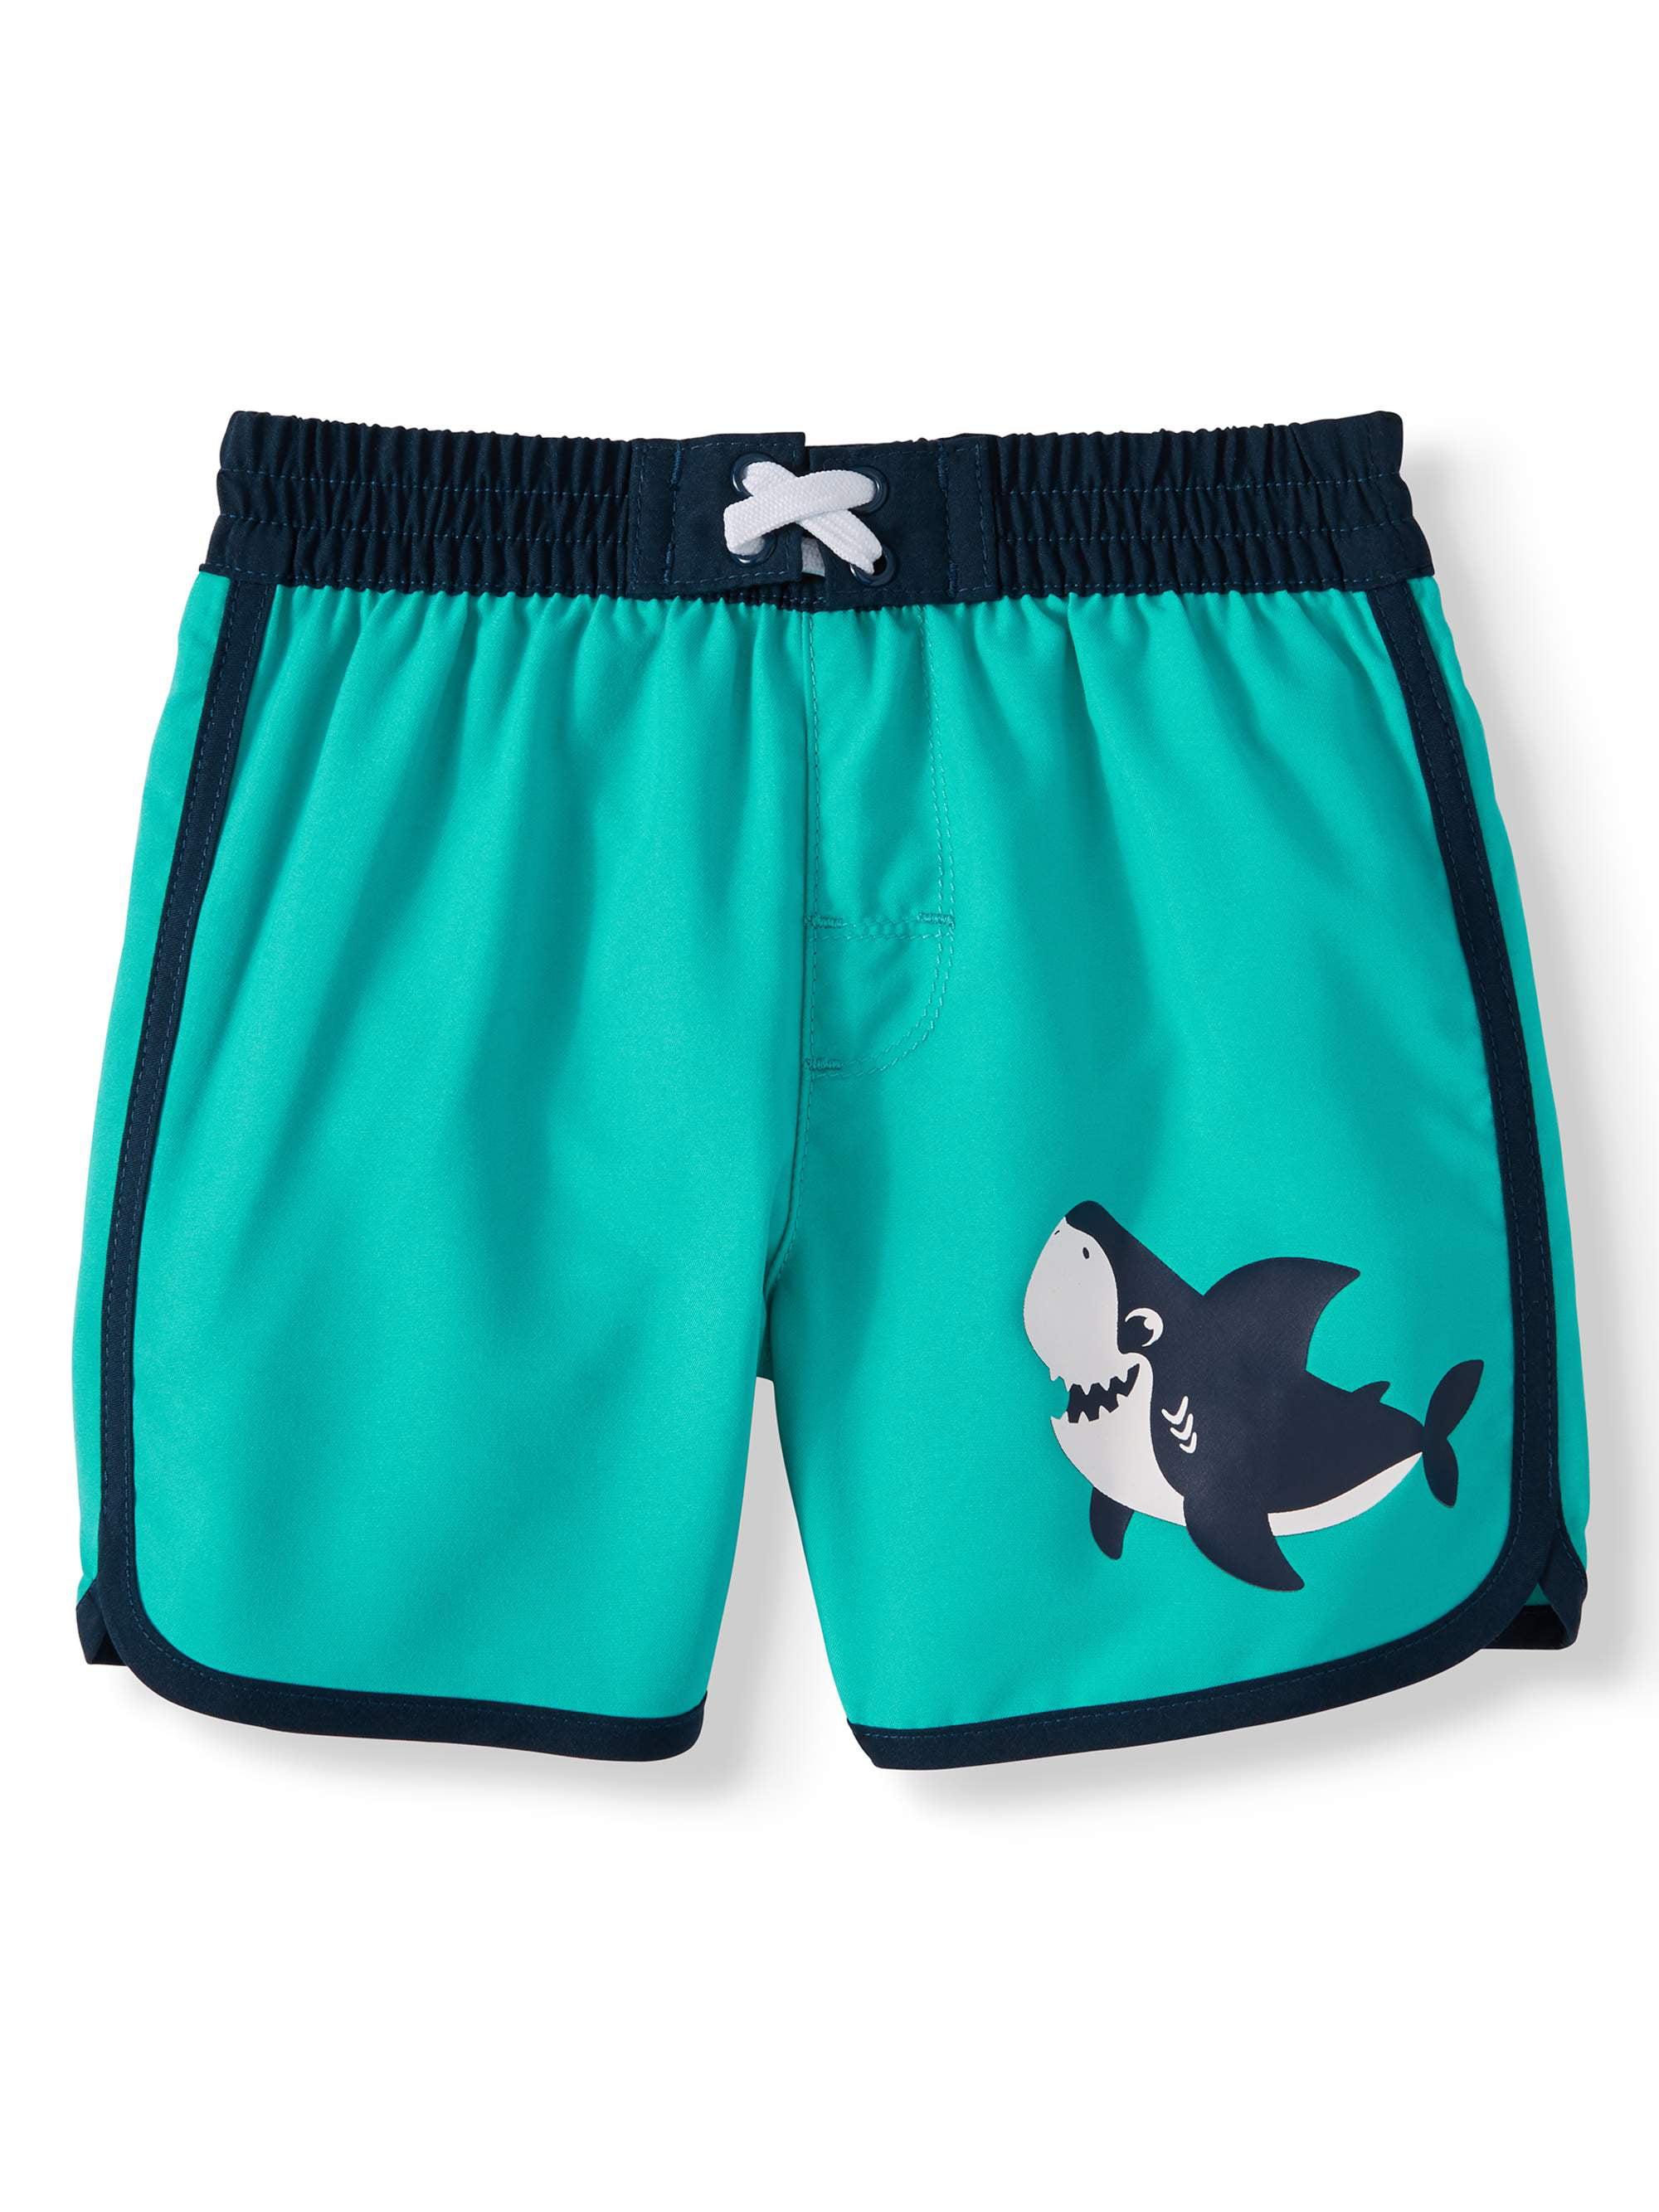 Wonder Nation Infant Boys Whales All Over Sky Blue Swim Short Trunk